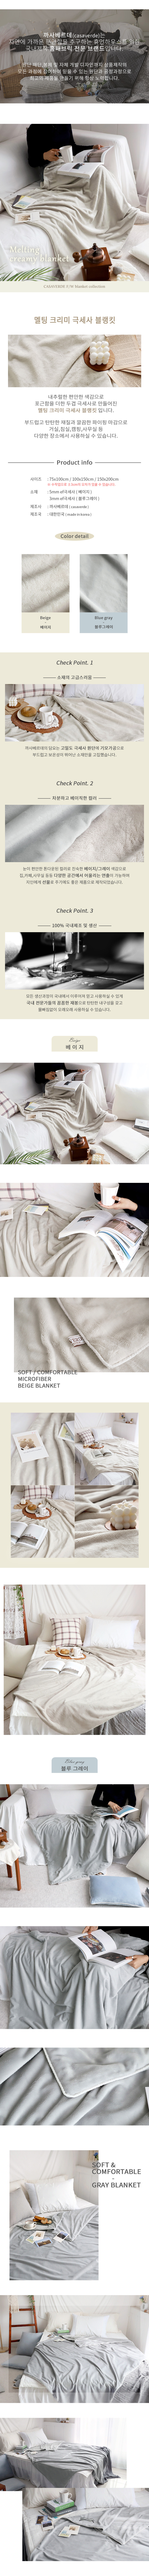 melting cream blanket-page_LOW.jpg